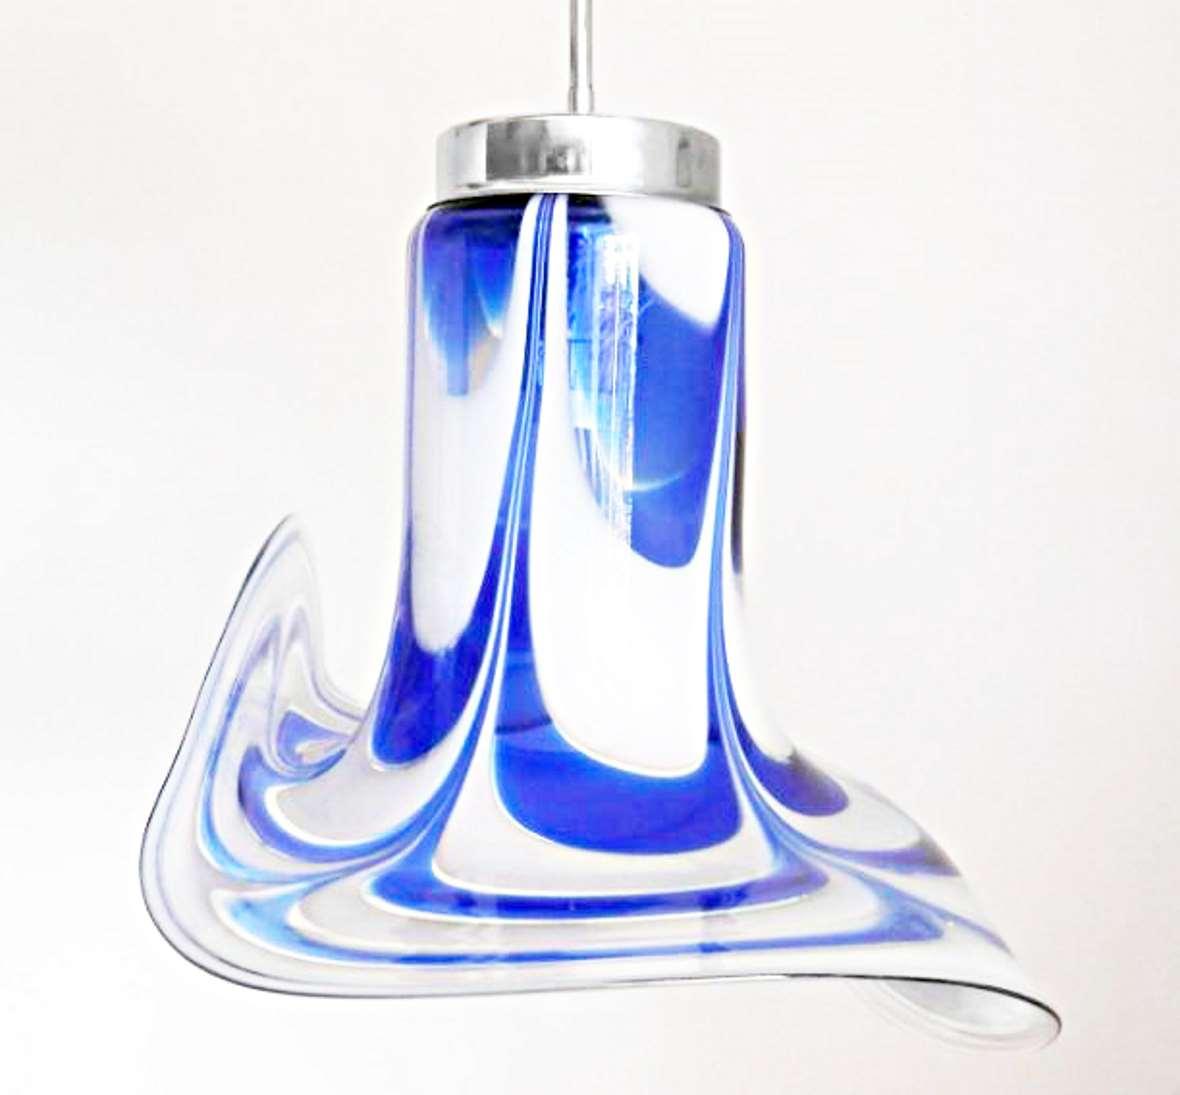 AV Mazzega Blue & White Glass Chandelier Murano 1970s 1980s aluminium MCM Carlo Nason